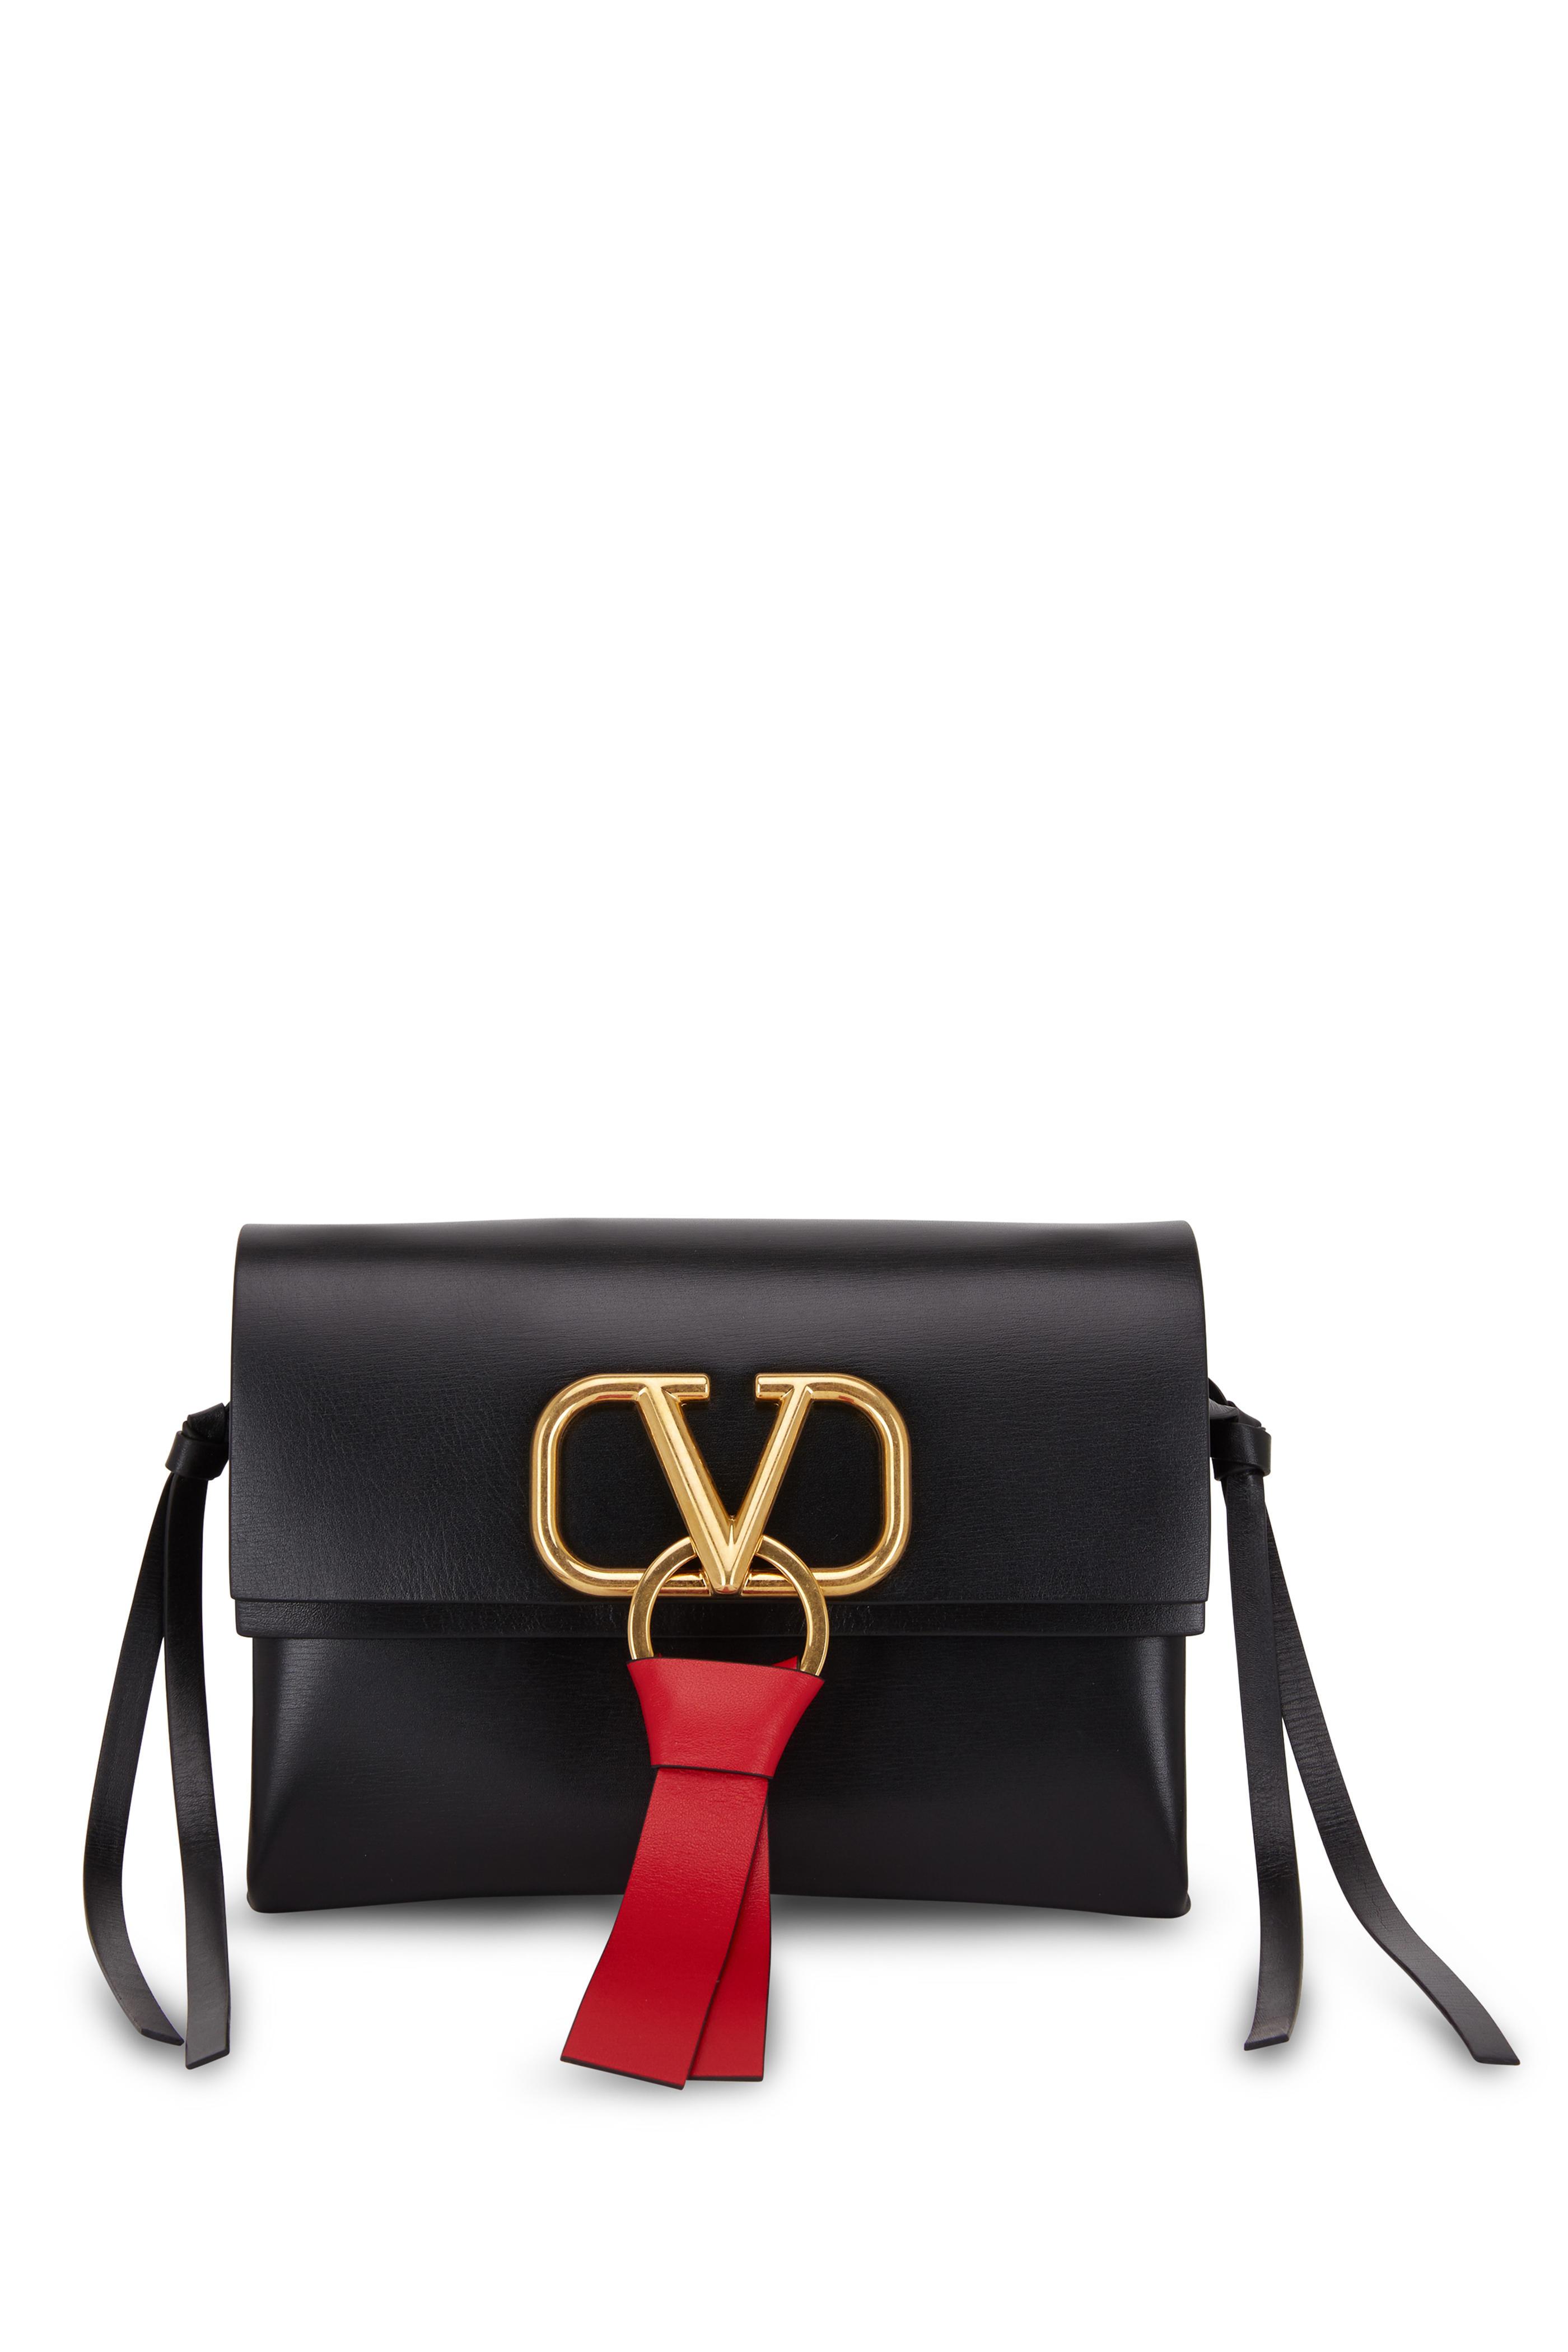 b8689c0fa8 Valentino Garavani - VRing Black & Red Leather Small Crossbody Bag ...